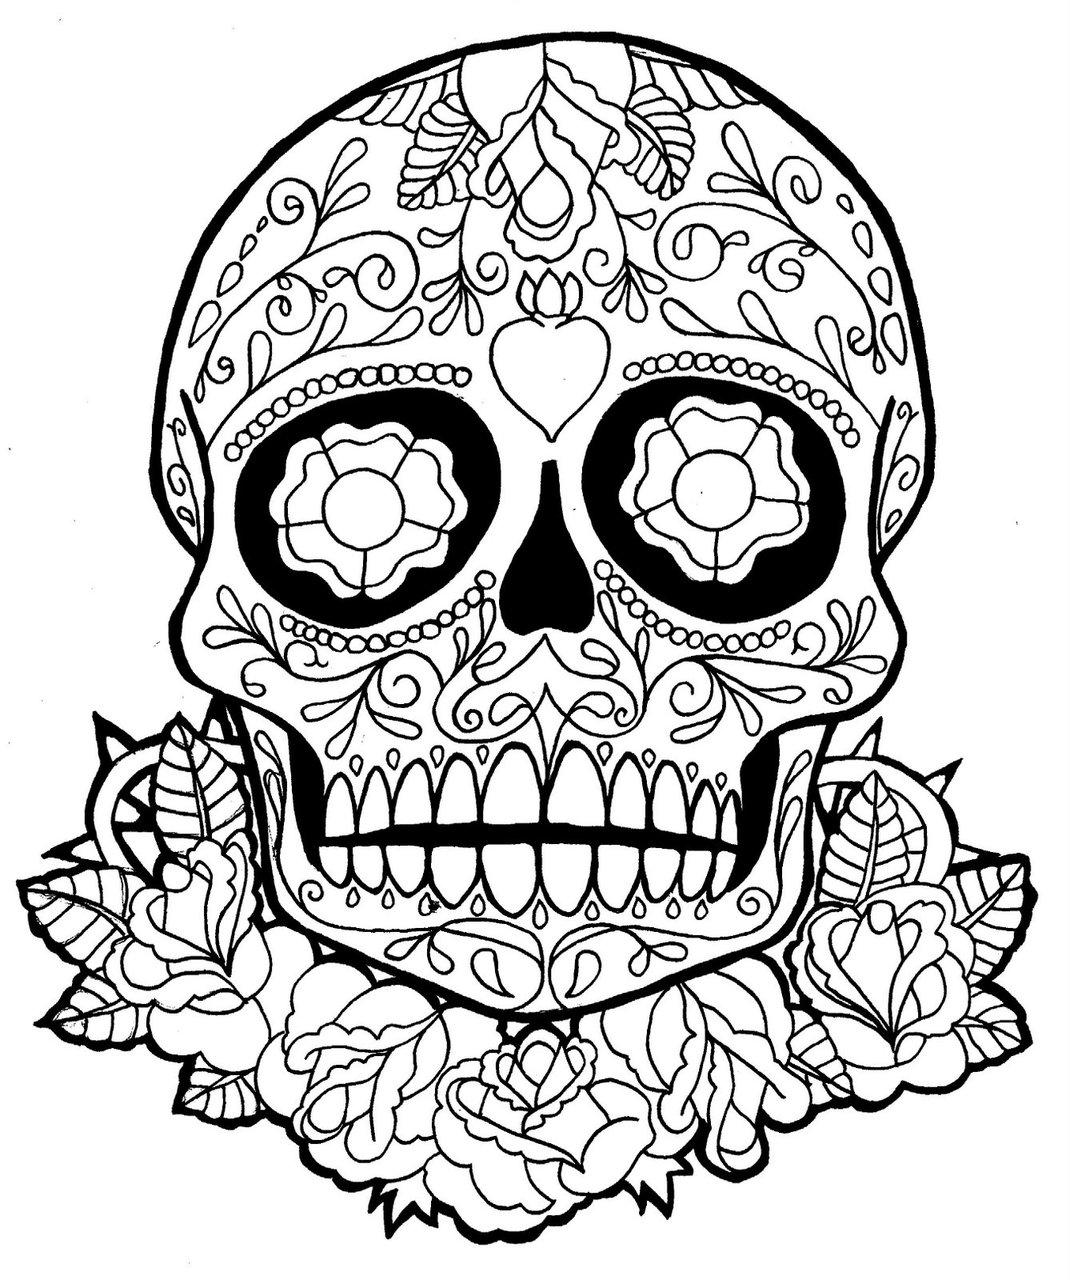 Incroyable crâne à colorier Día de los Muertos